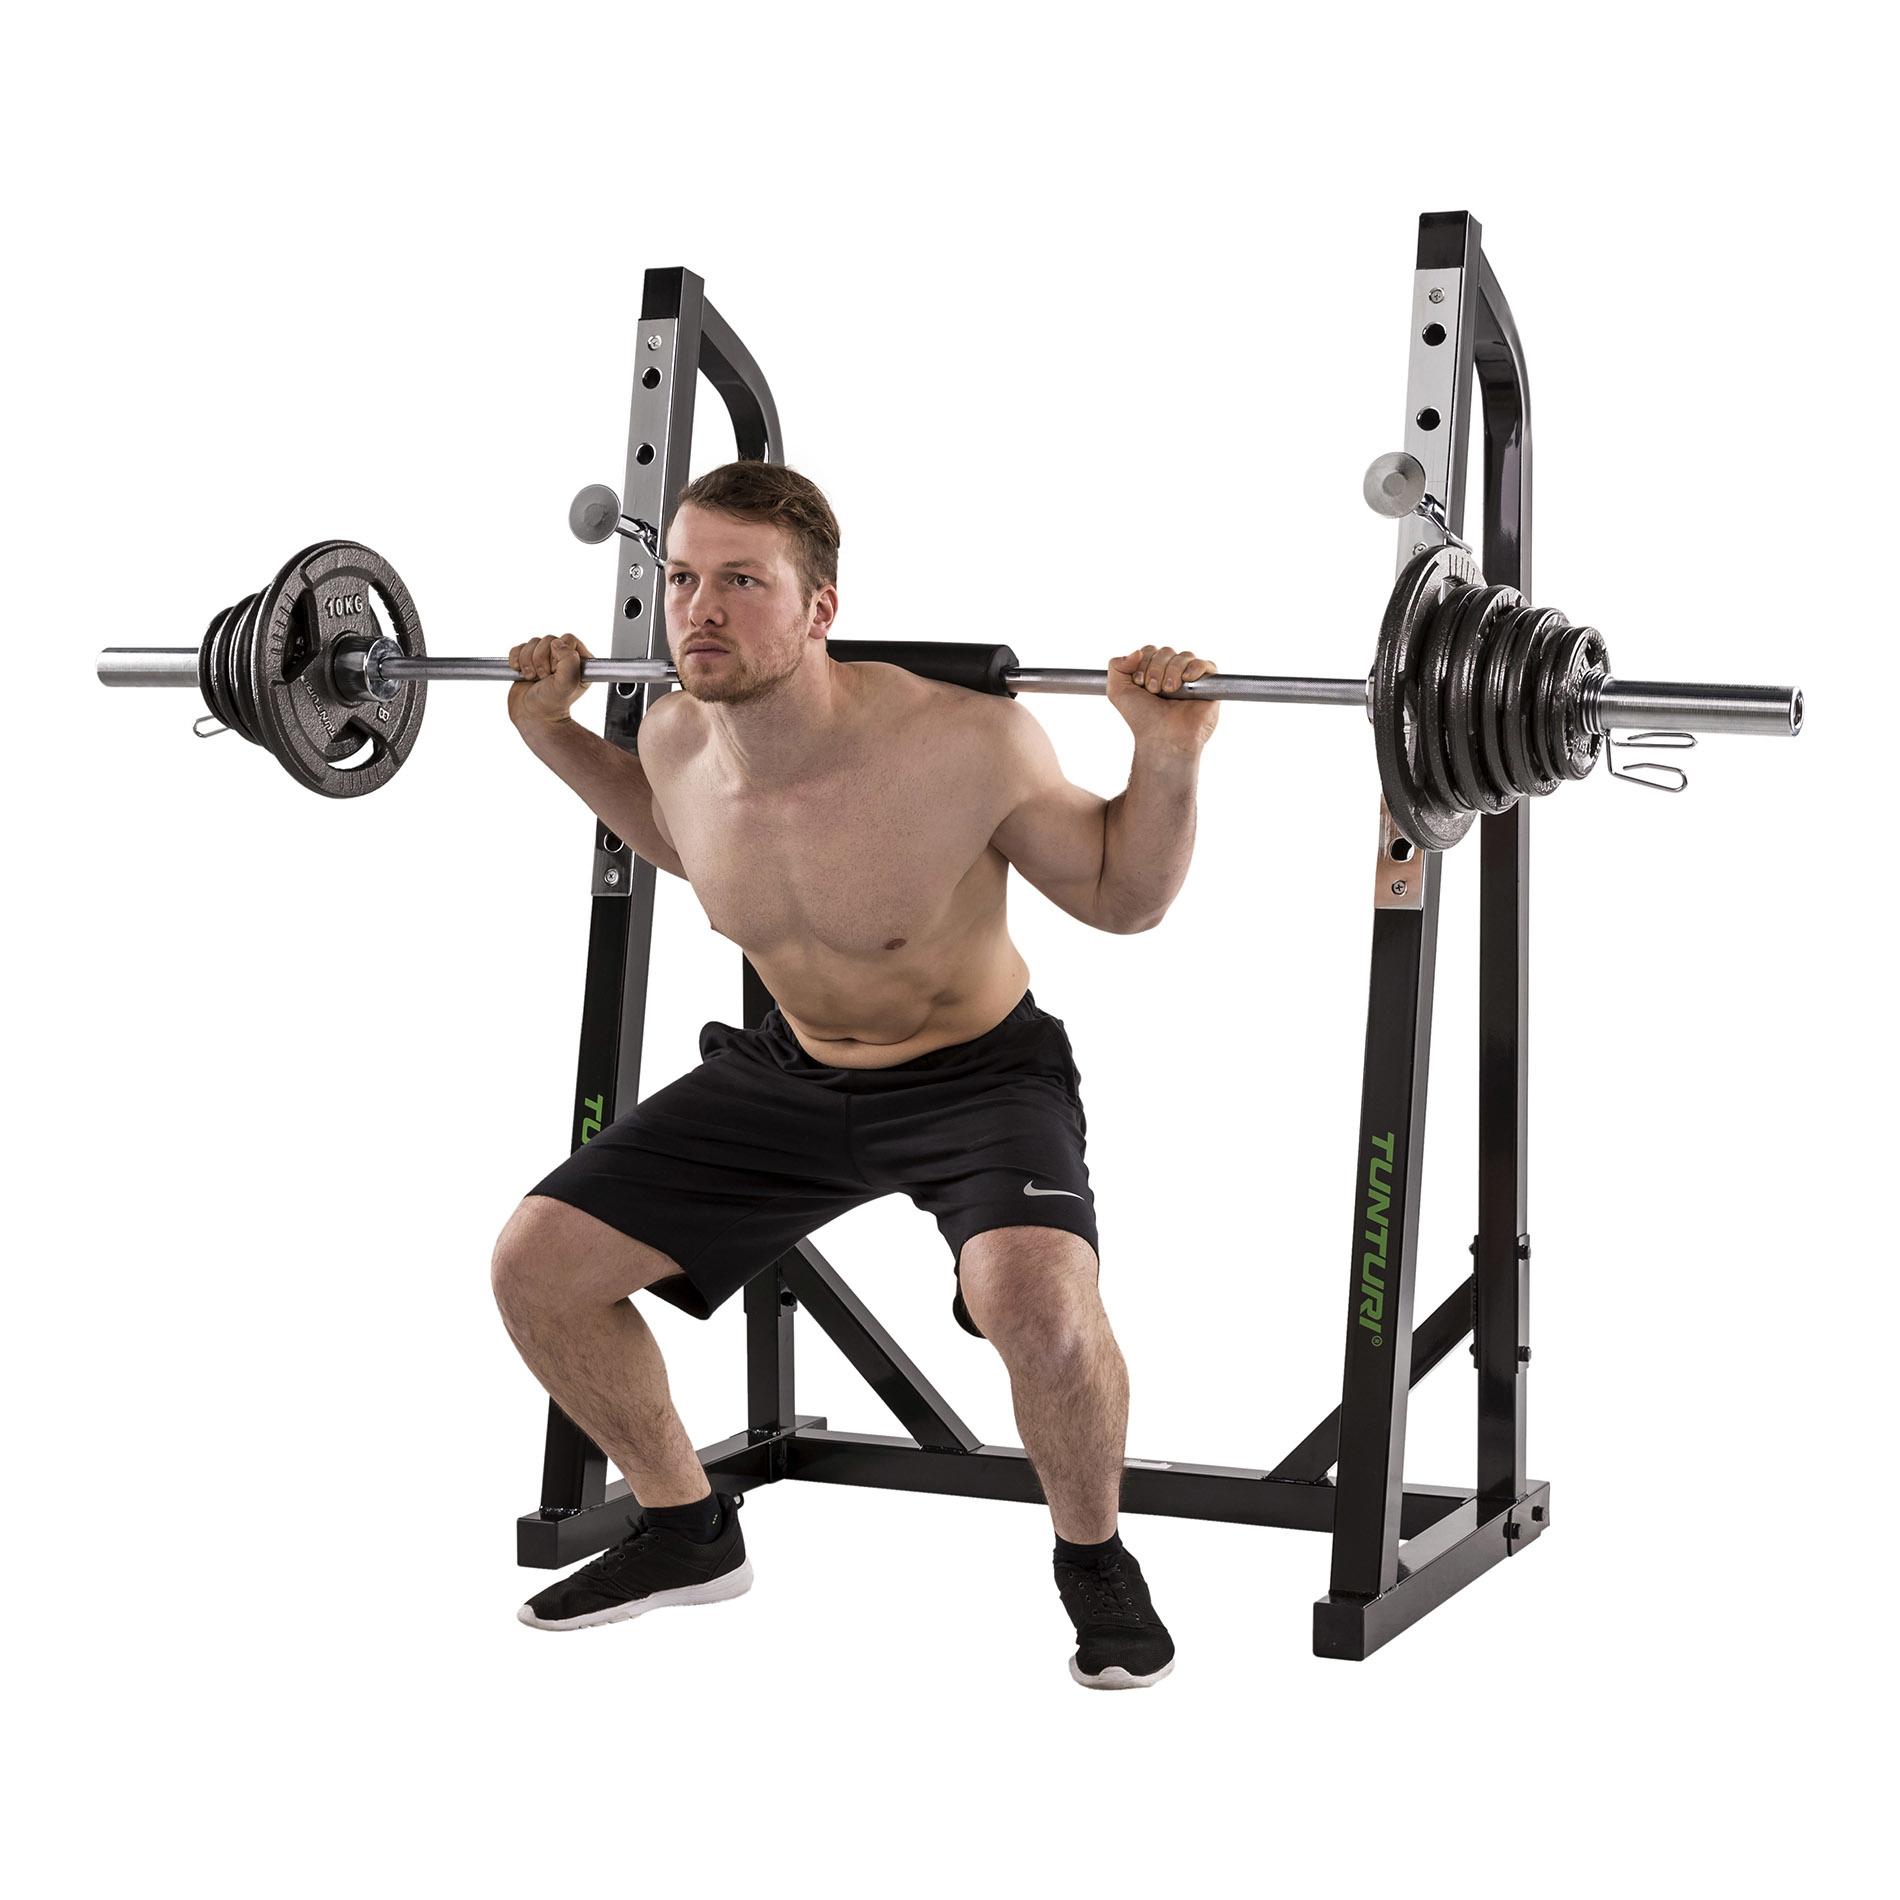 tunturi squat rack wt40 demo